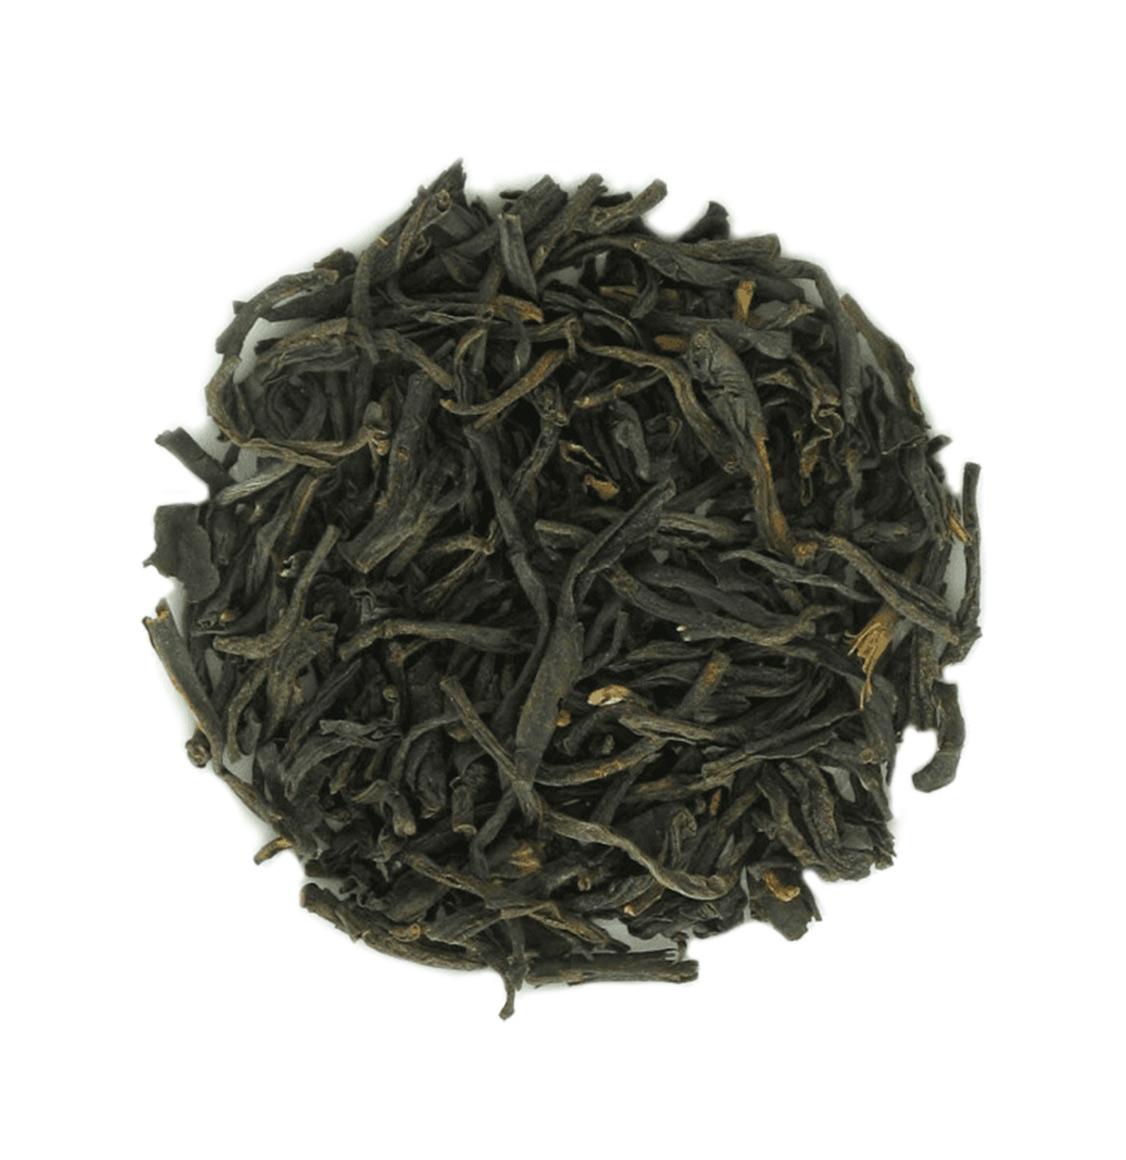 Kusmi Tea St Petersburg Exclusive Blend 125g